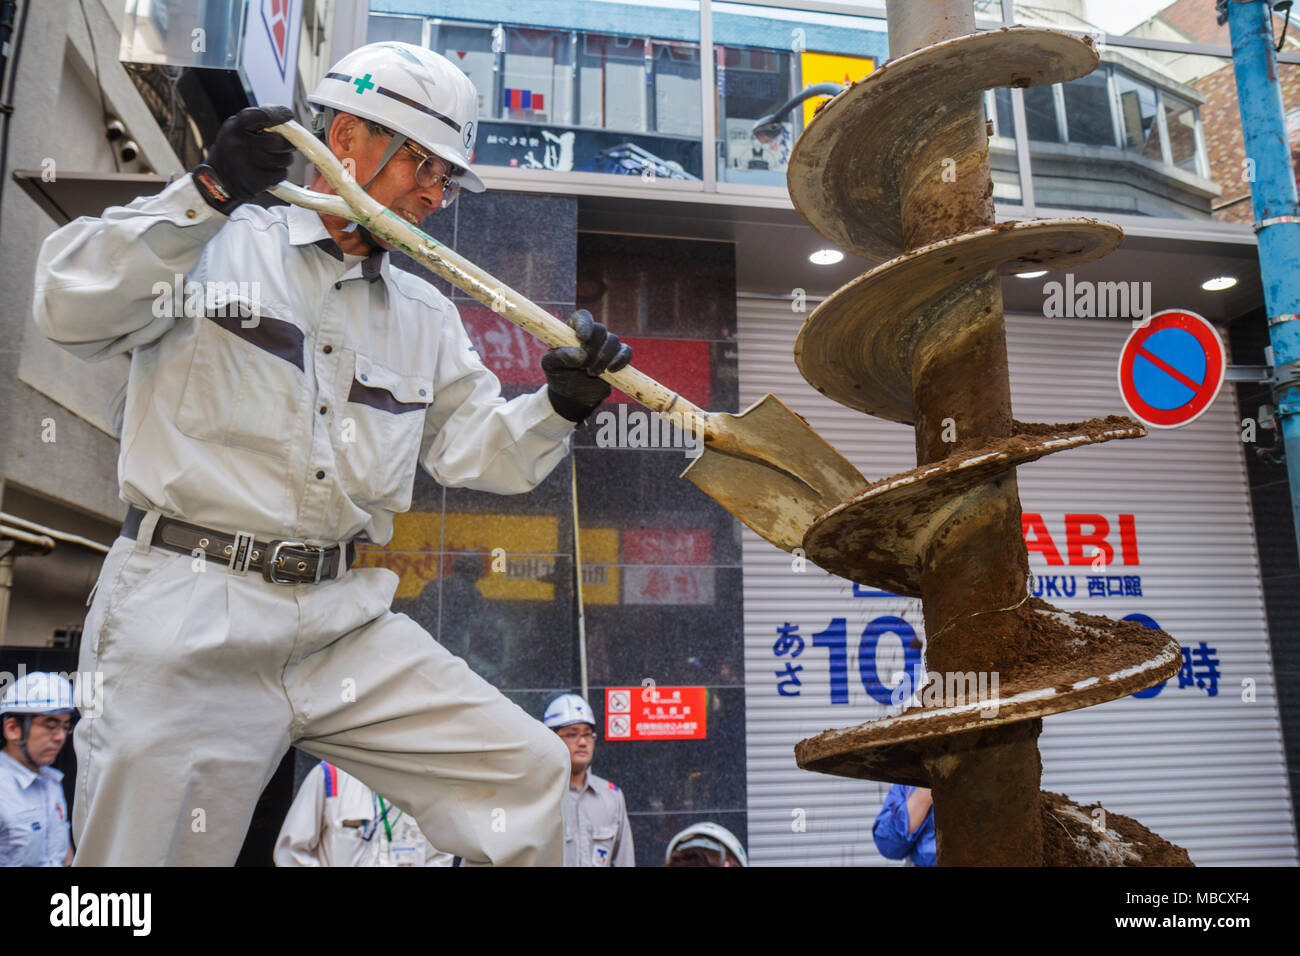 Tokyo Japan Shinjuku Asian man utility construction worker drill shovel hard hat uniform job - Stock Image